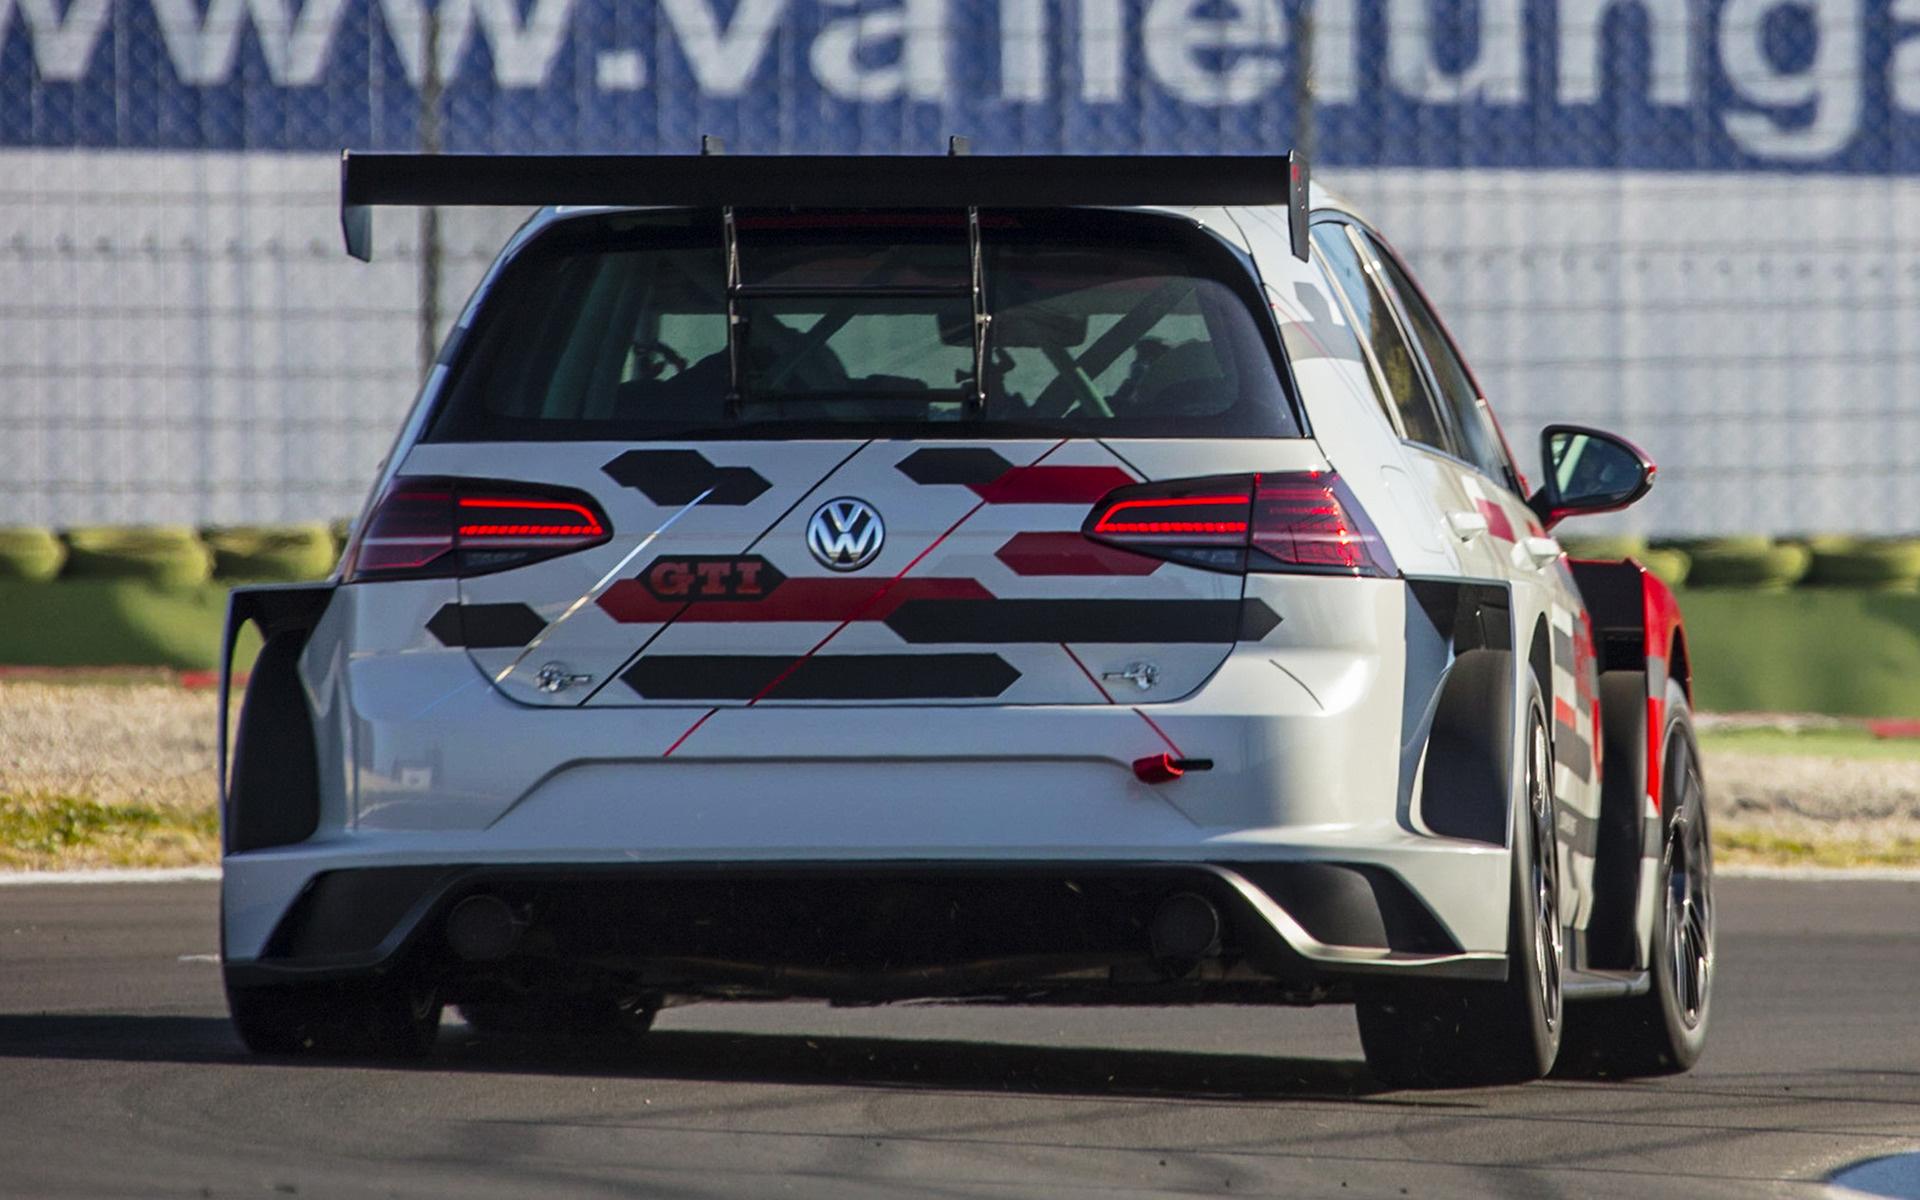 2018 Volkswagen Golf Gti Tcr Fondos De Pantalla E Imágenes